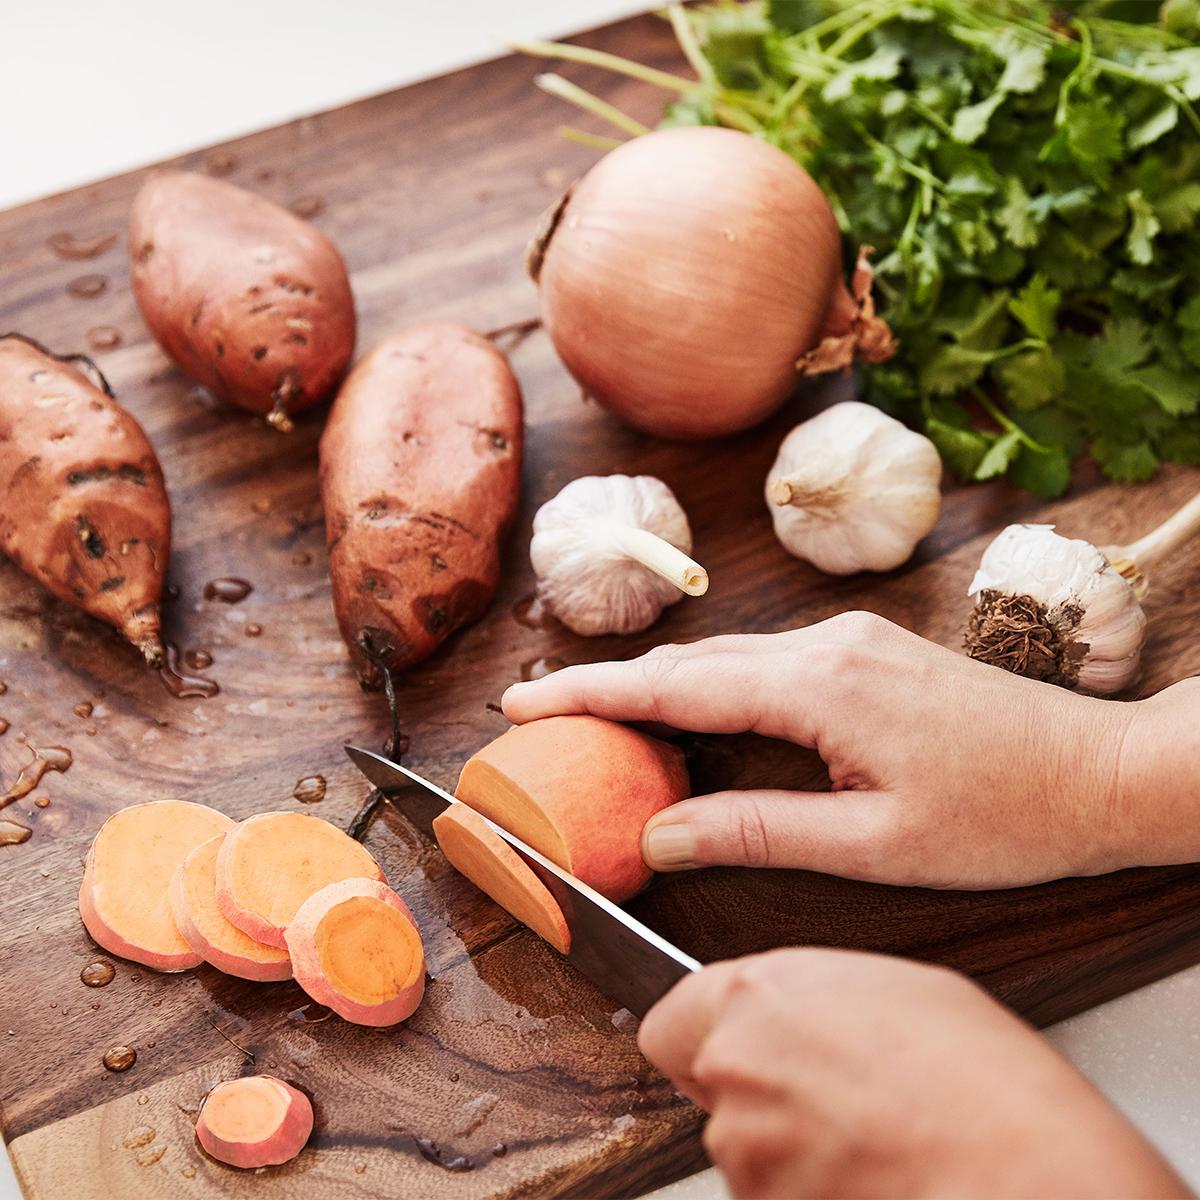 emma chapman cutting board sweet potatoes